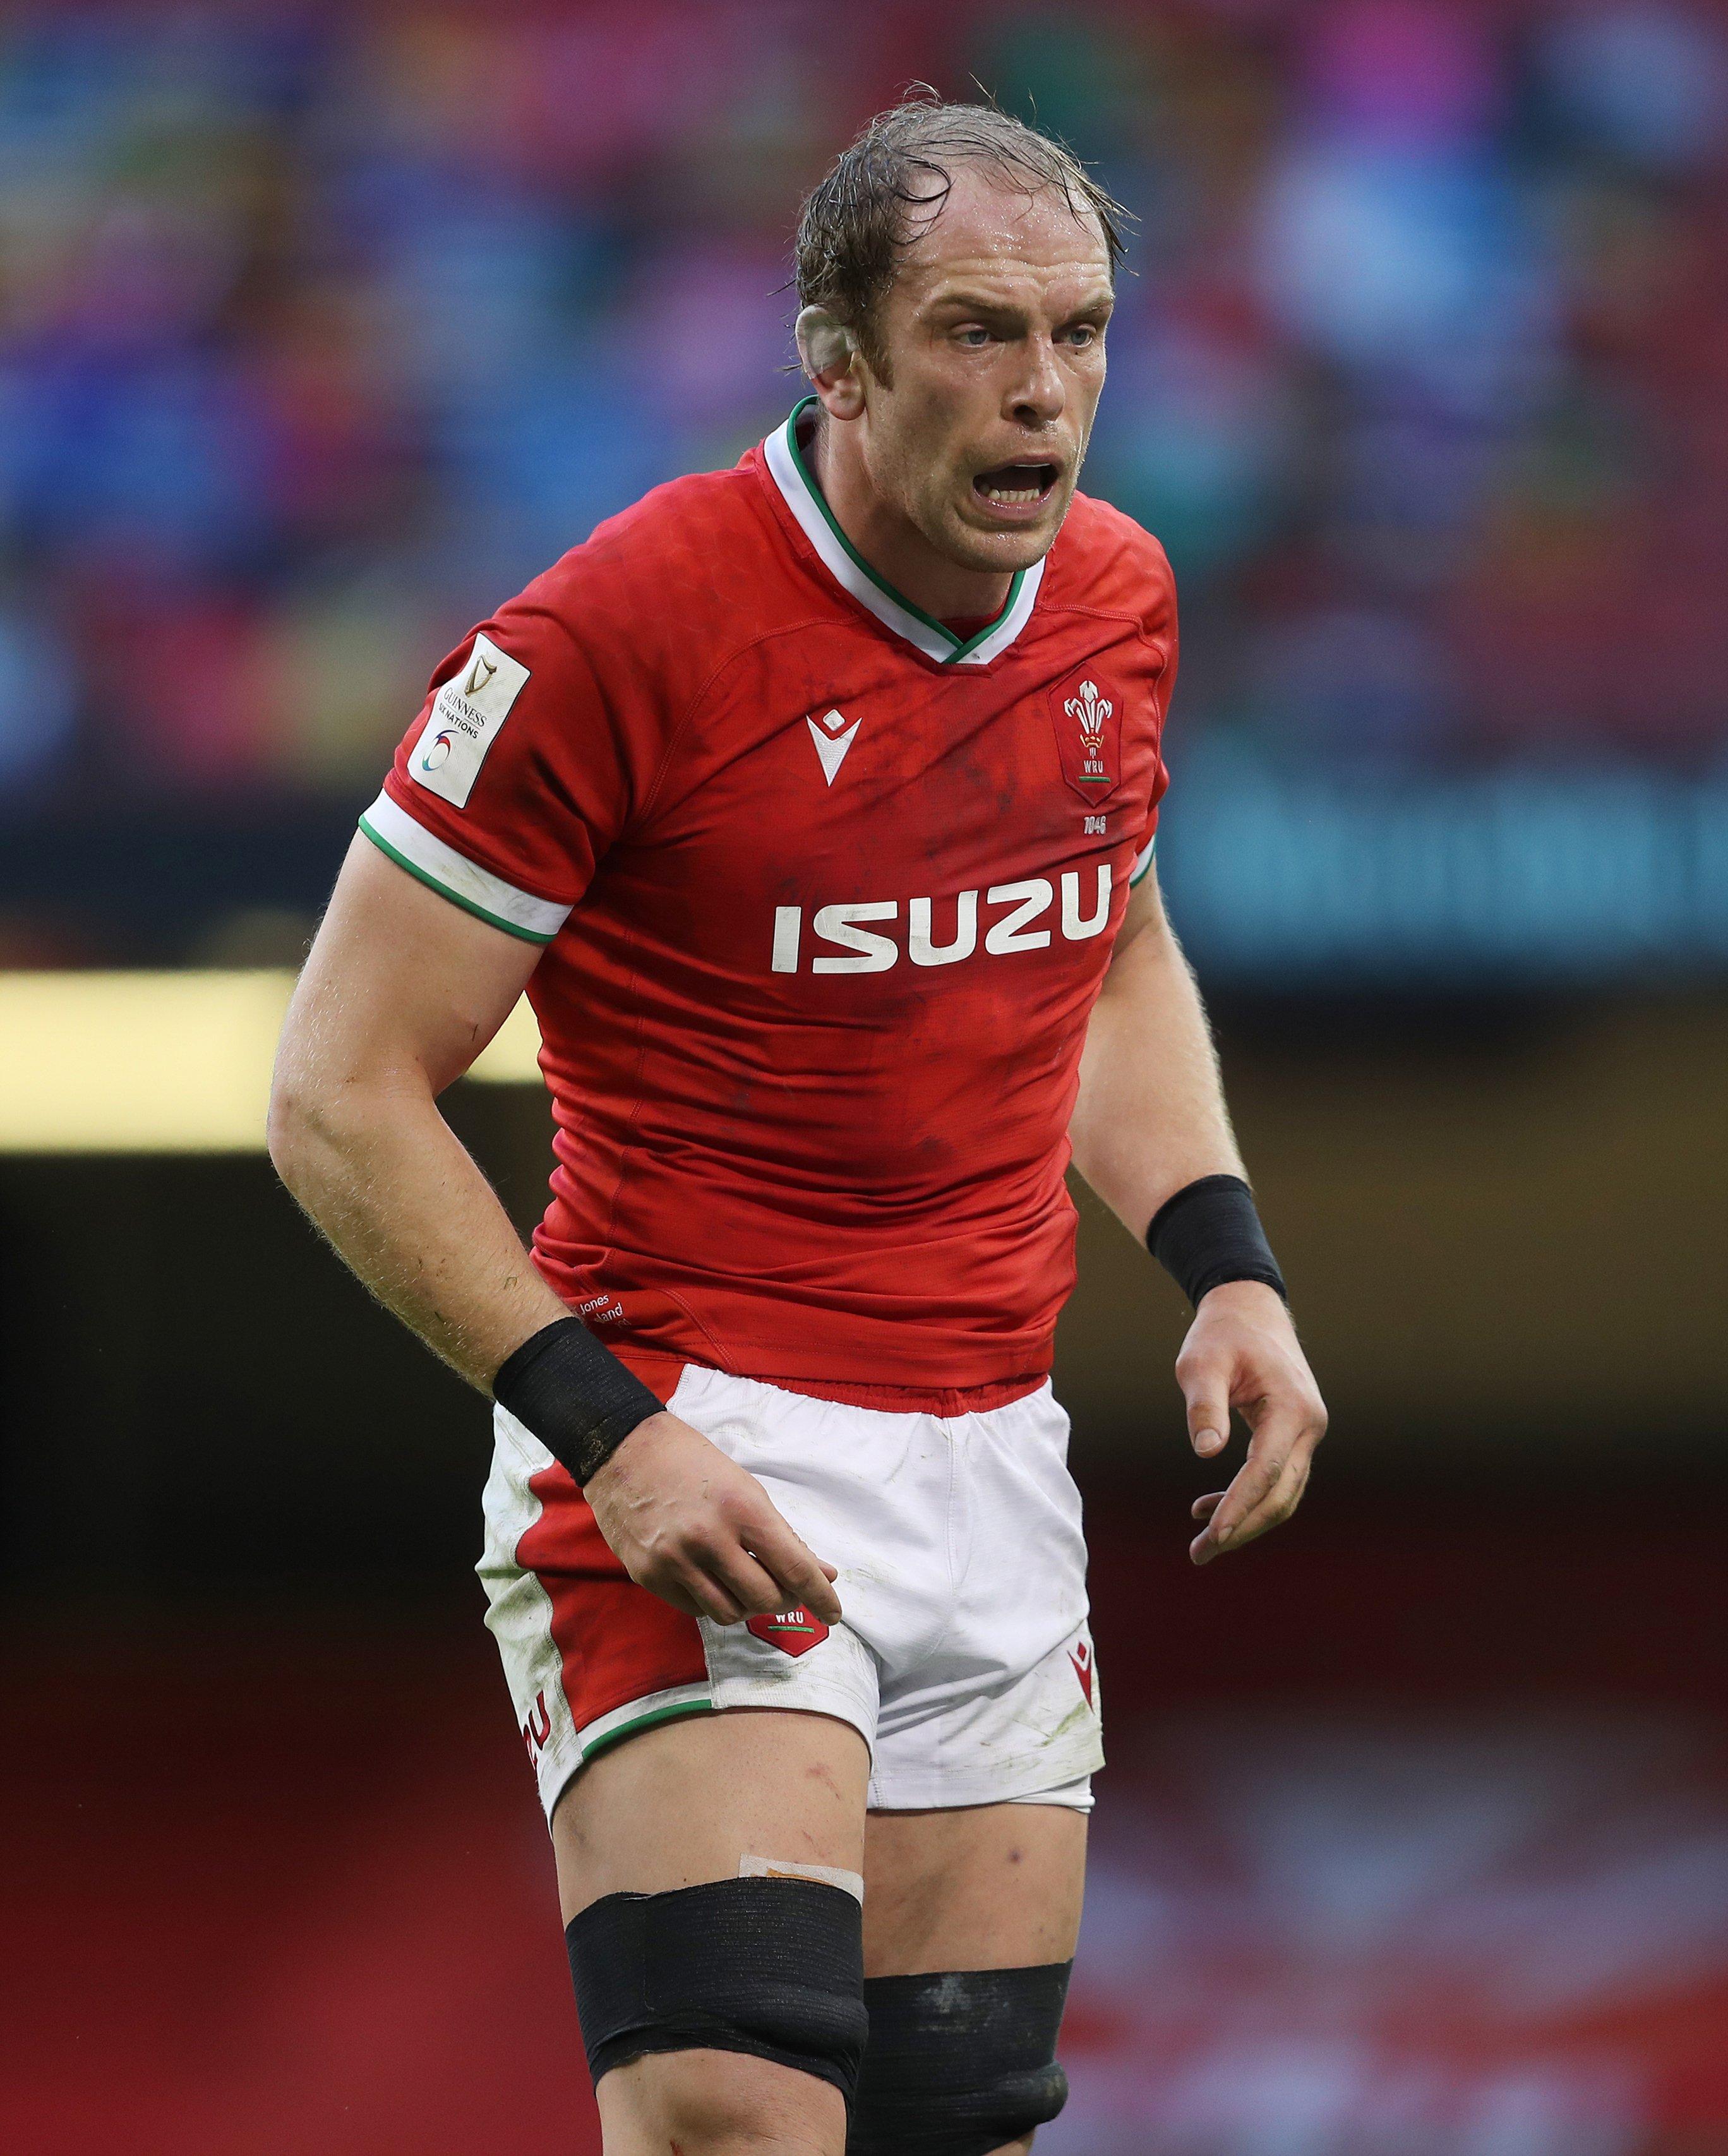 Wales captain Alun Wyn Jones warns Italy threat must be taken seriously